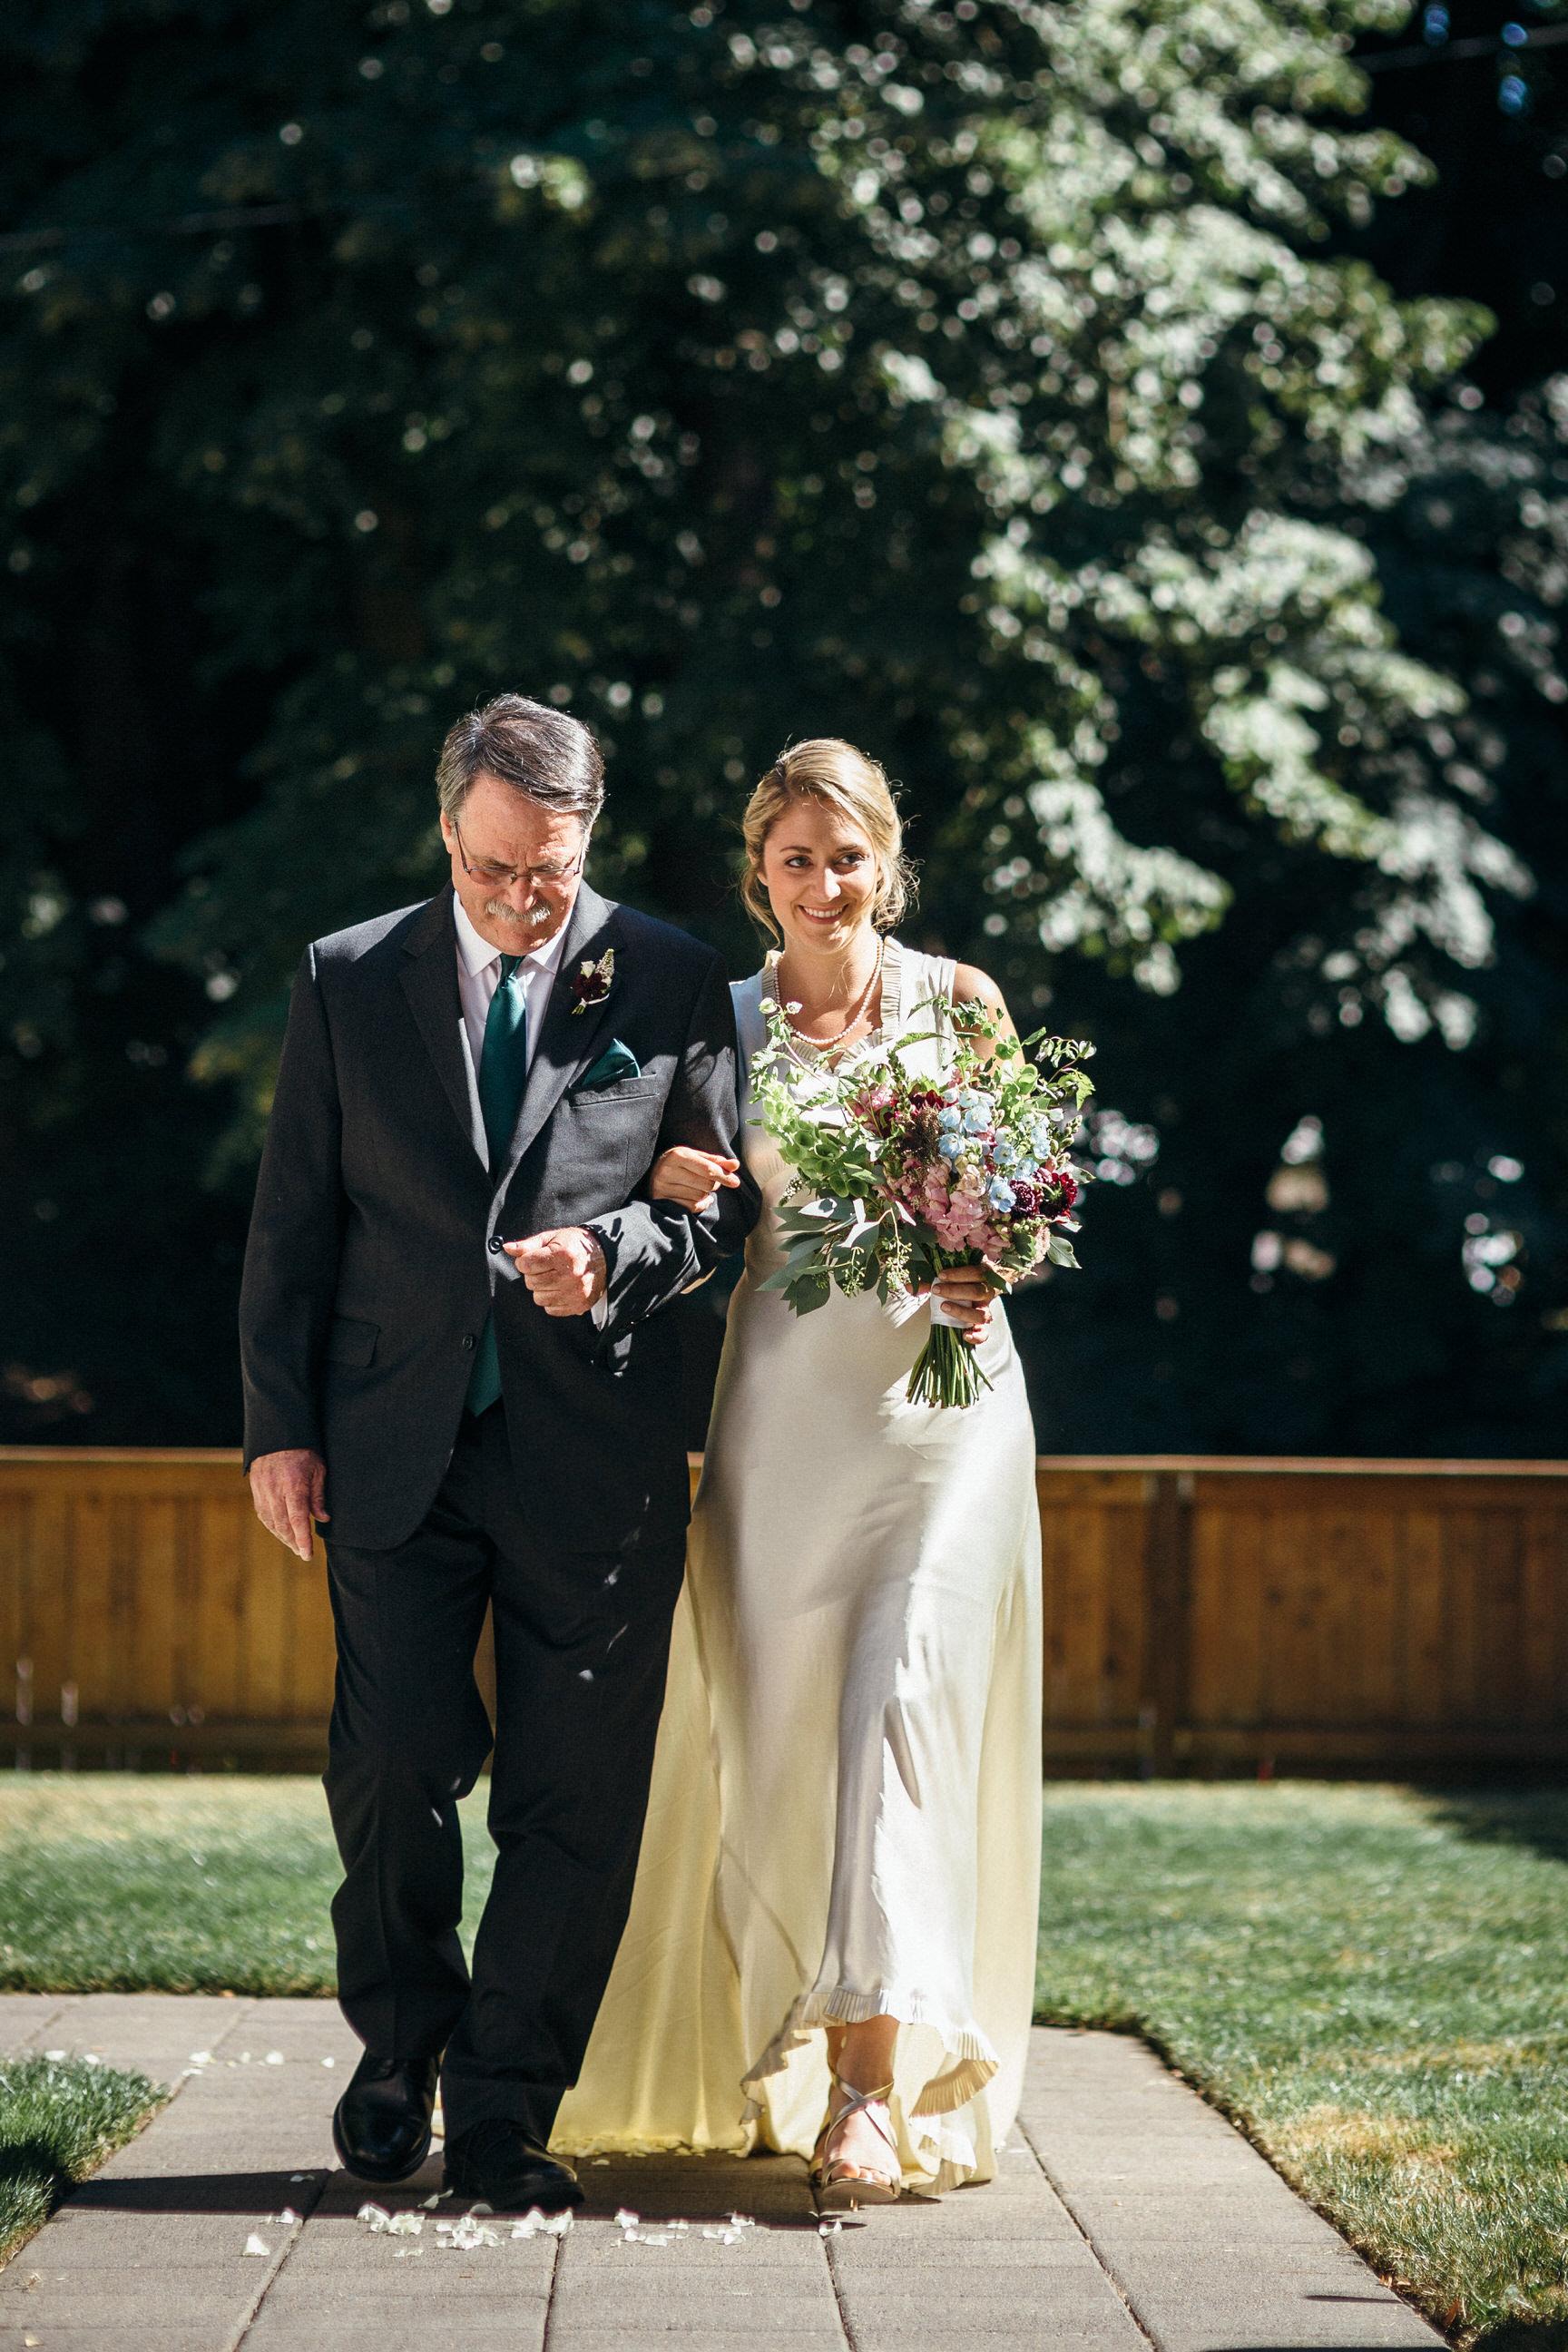 Laurelhurst Park club wedding photographer Portand pdx Oregon051.JPG